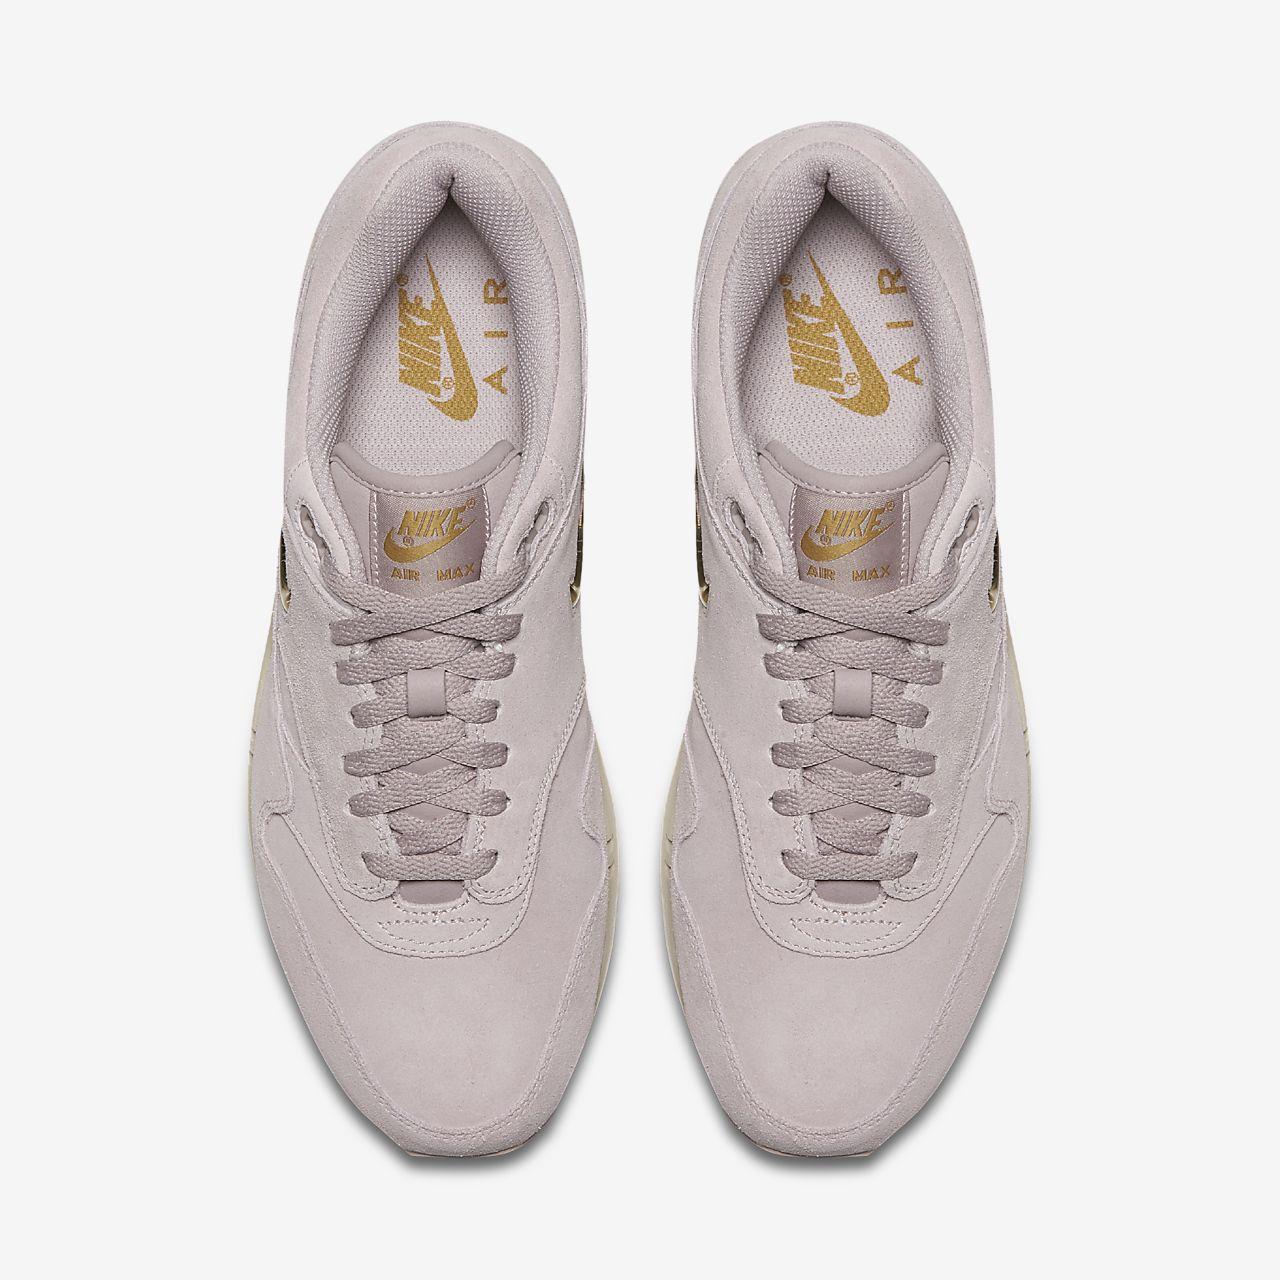 brand new af60b 82d2a ... Nike Air Max 1 Premium SC Men s Shoe